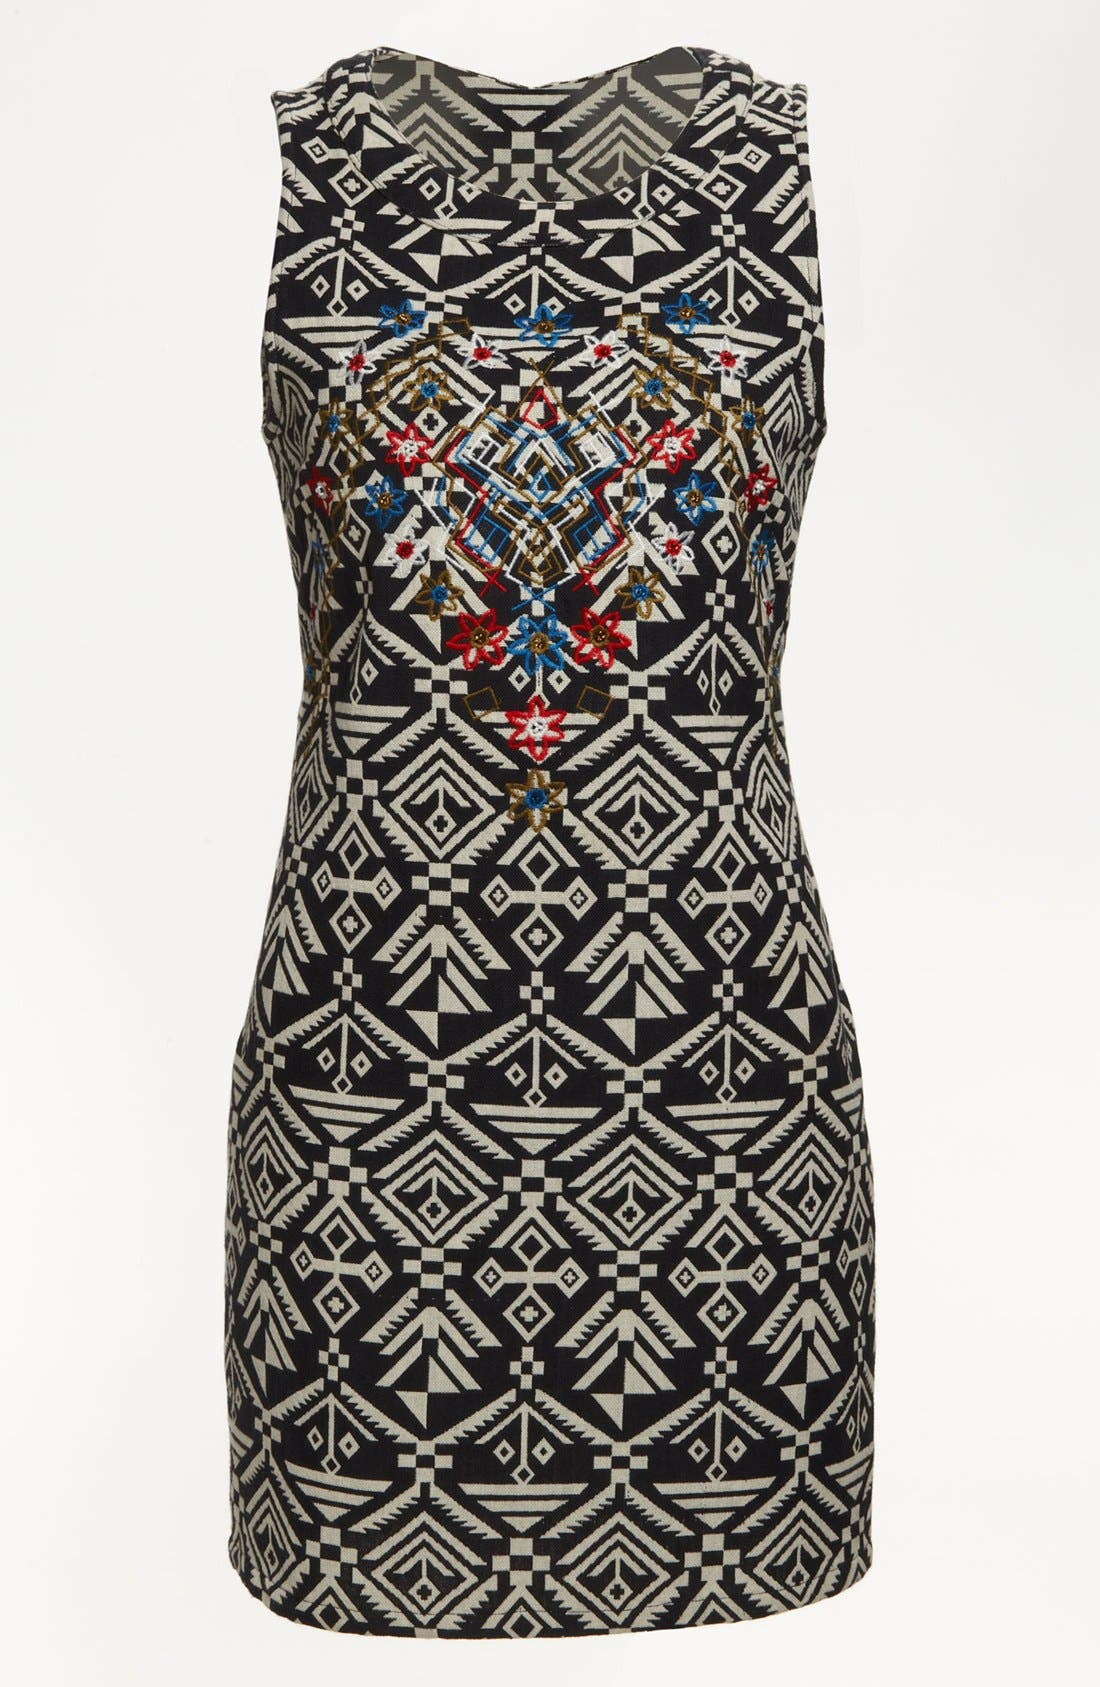 Main Image - ASTR Tribal Print Body-Con Dress